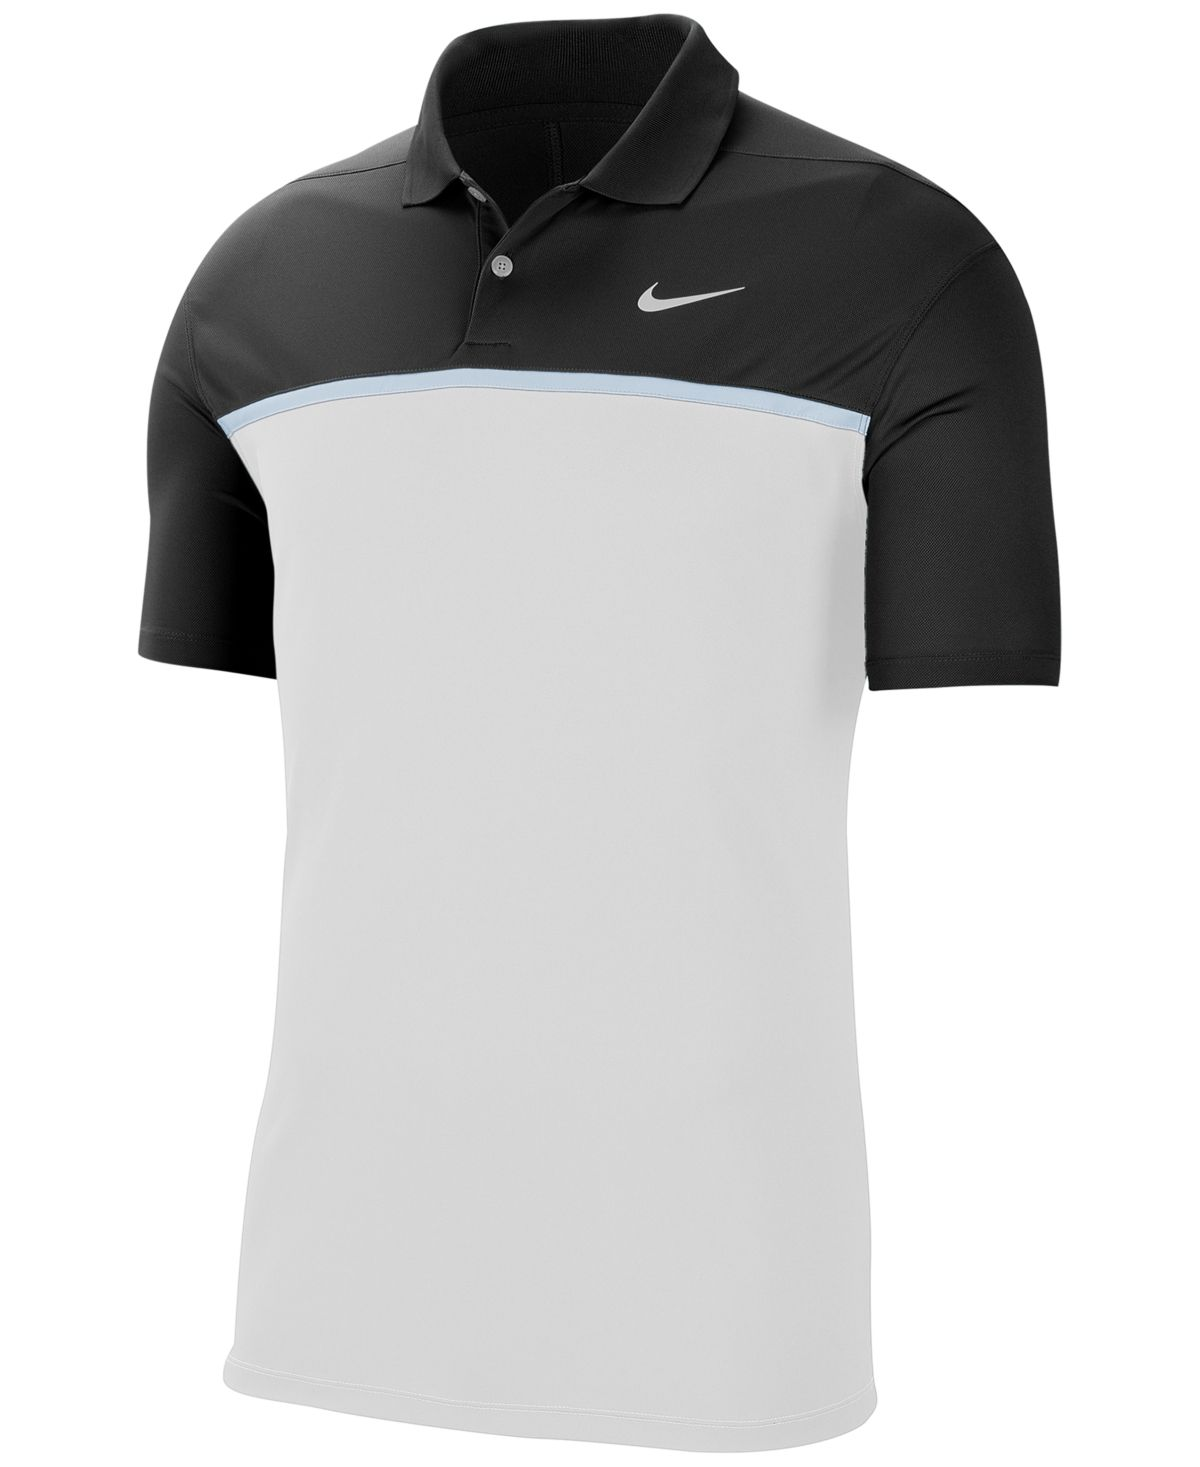 Nike Men's Victory Dri-fit Colorblocked Golf Polo - Black | Mens ...